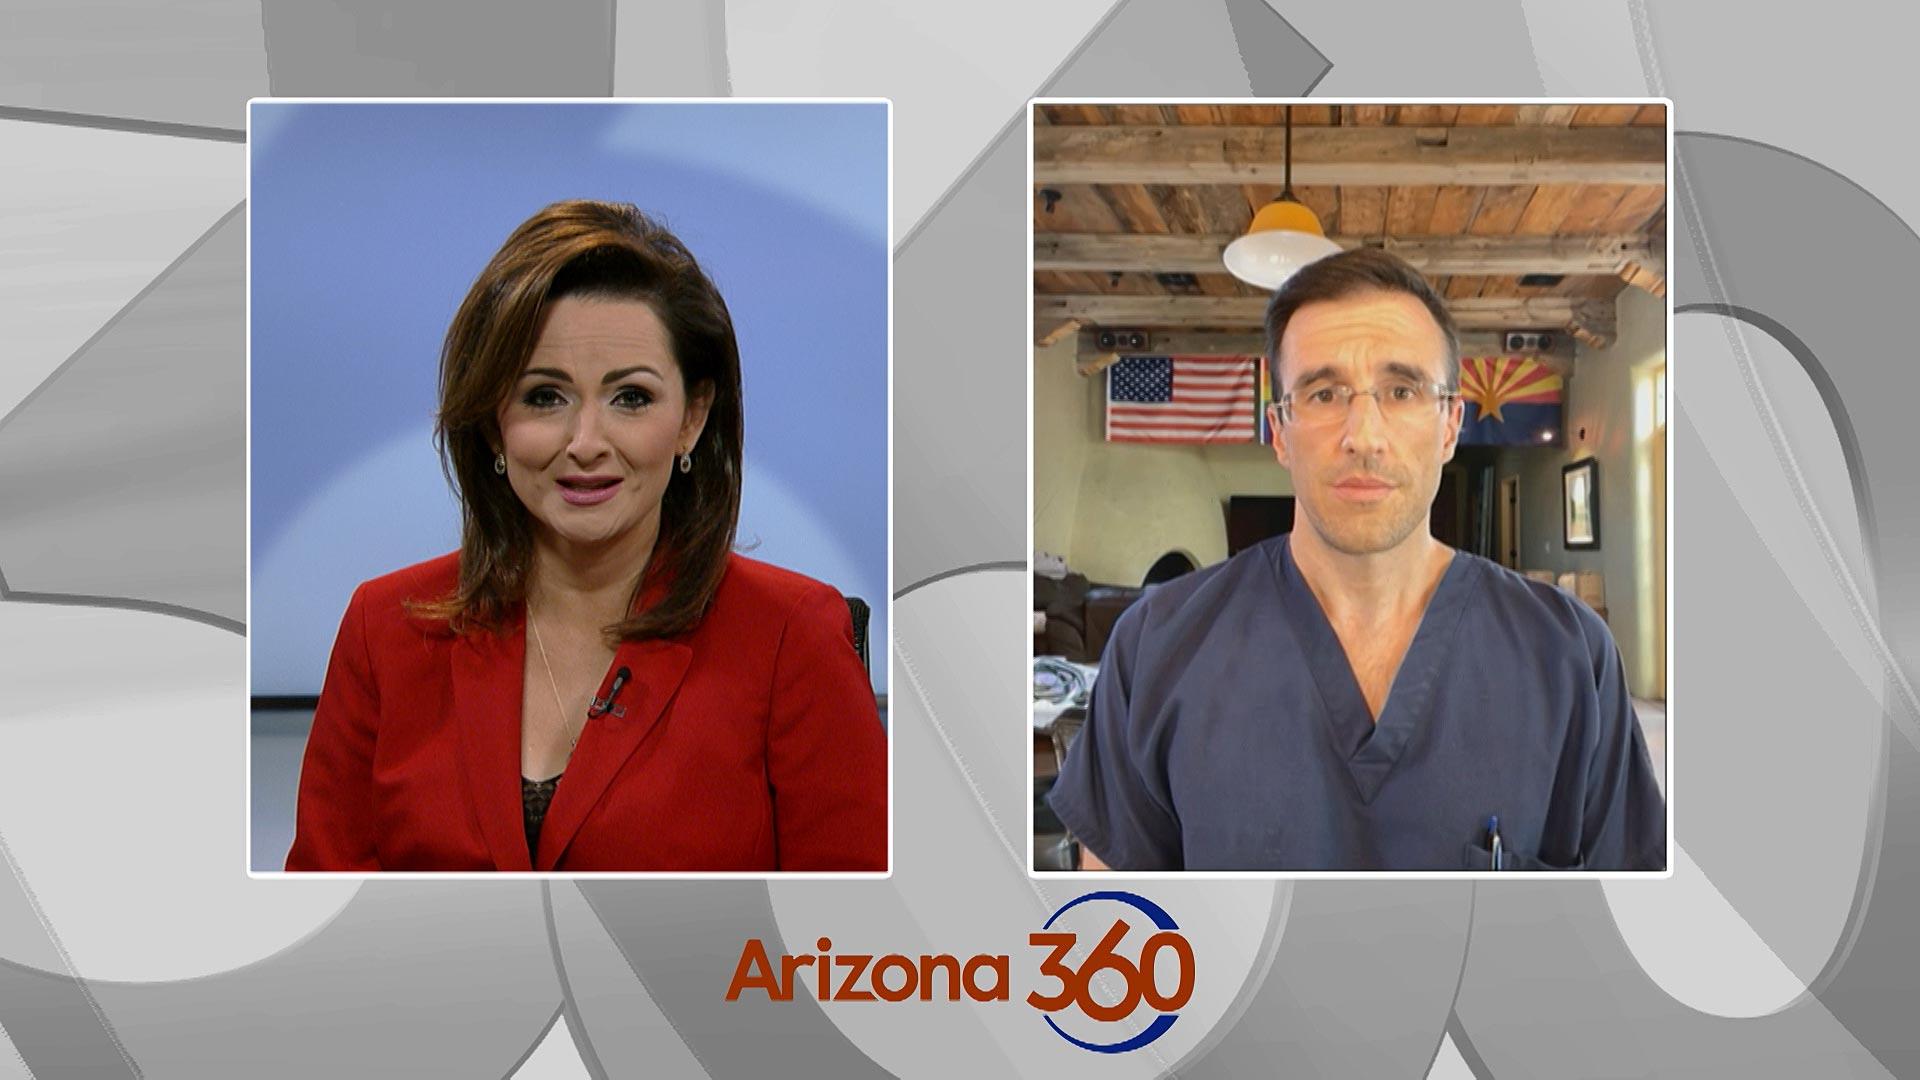 Pima County District 2 Supervisor Matt Heinz during an interview with Arizona 360 host Lorraine Rivera on Jan. 21, 2021.